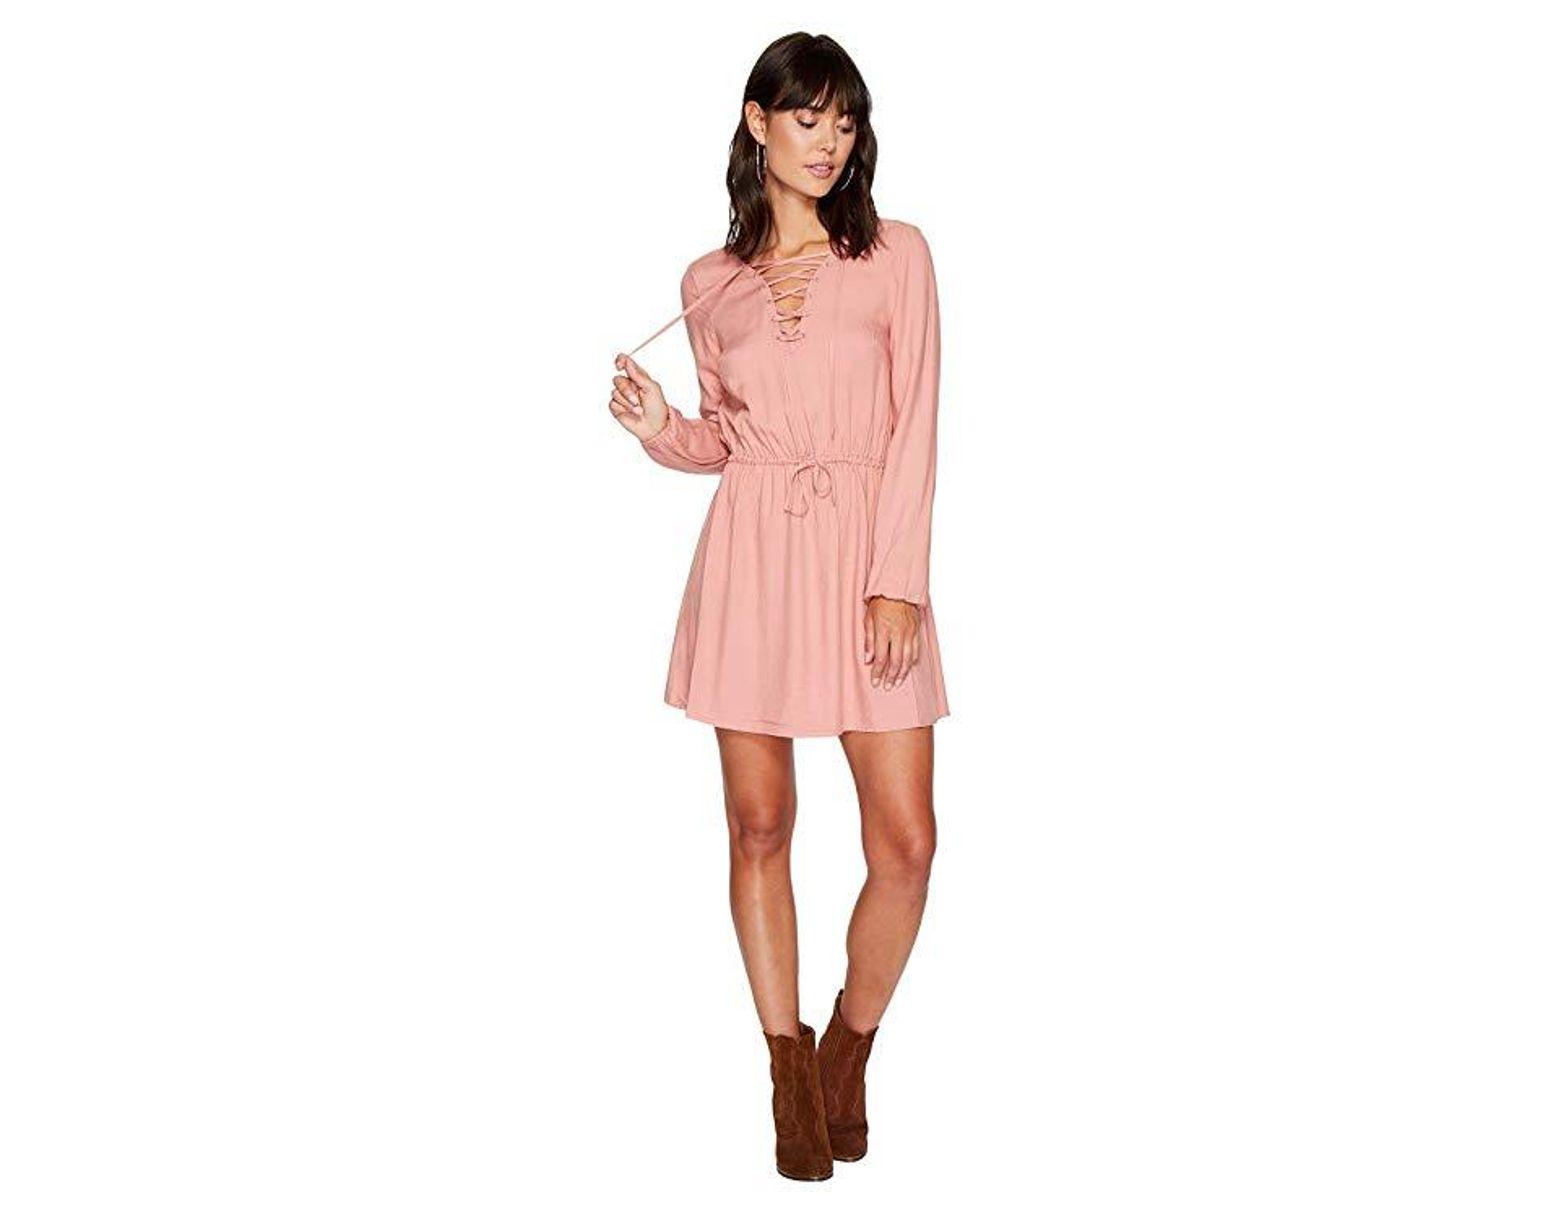 00894690a0 Jack BB Dakota Char Rayon Twill Lace-up Dress (rose Dawn) Dress in Pink -  Save 37% - Lyst